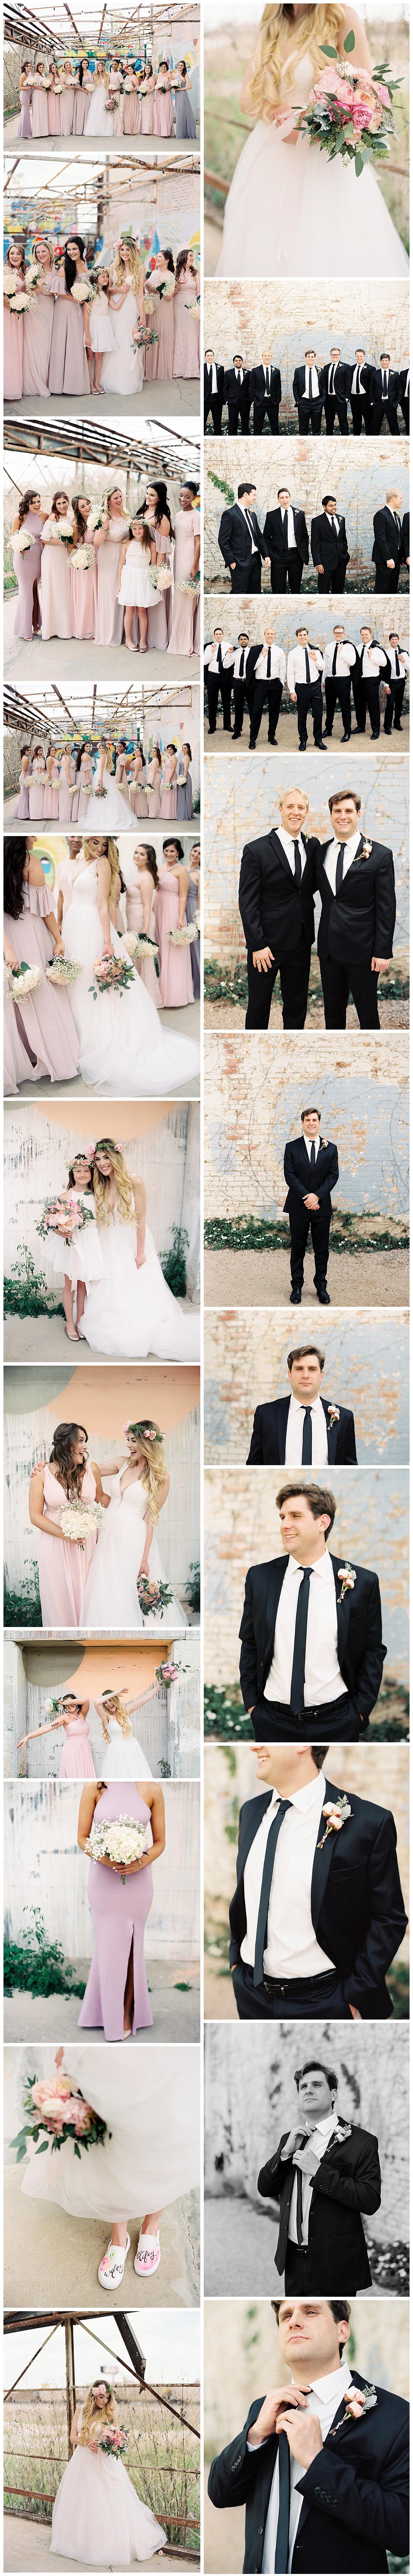 brik-venue-wedding-ar-photography-1.jpg